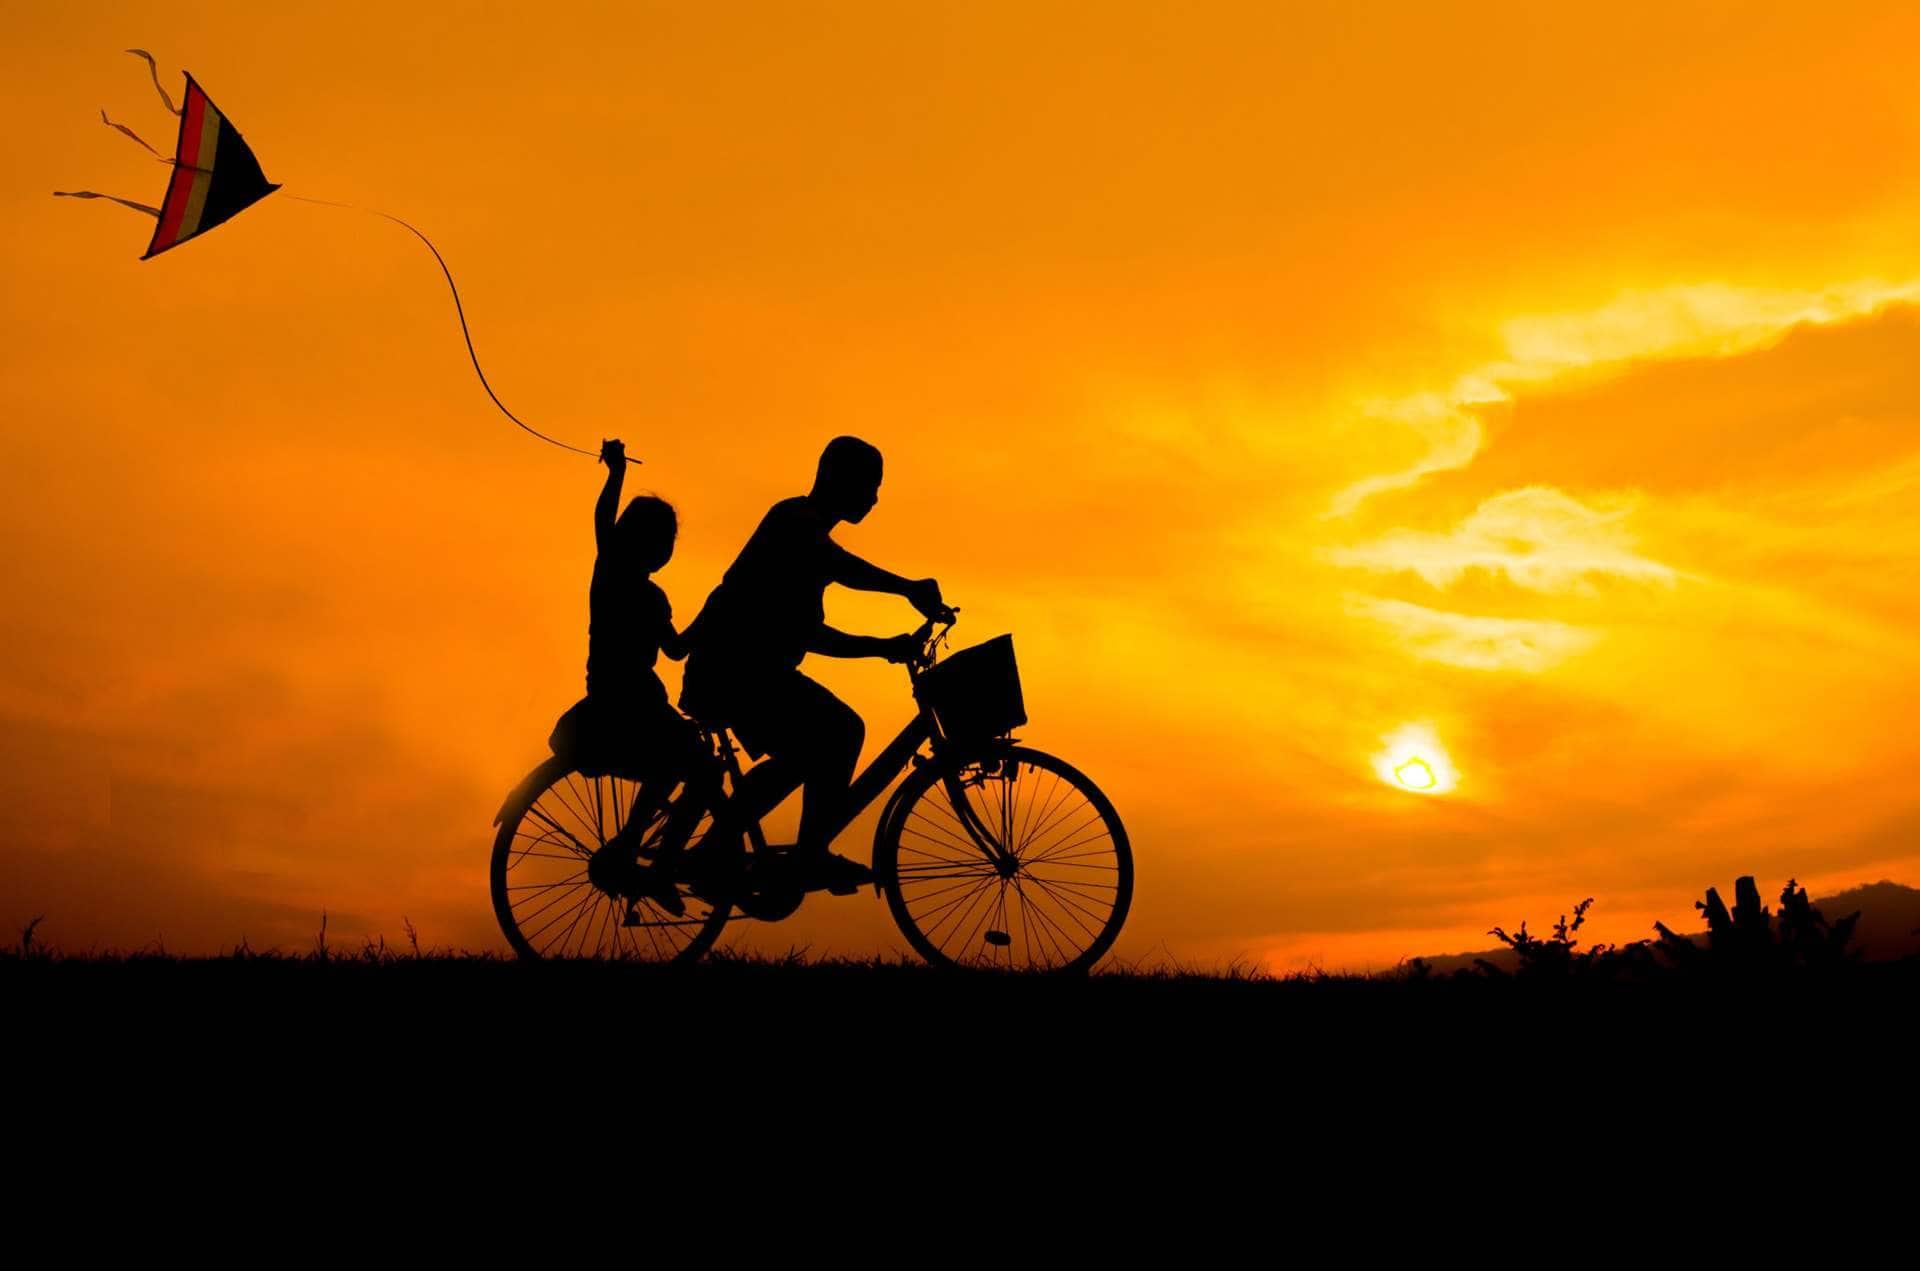 cycling a sense of freedom